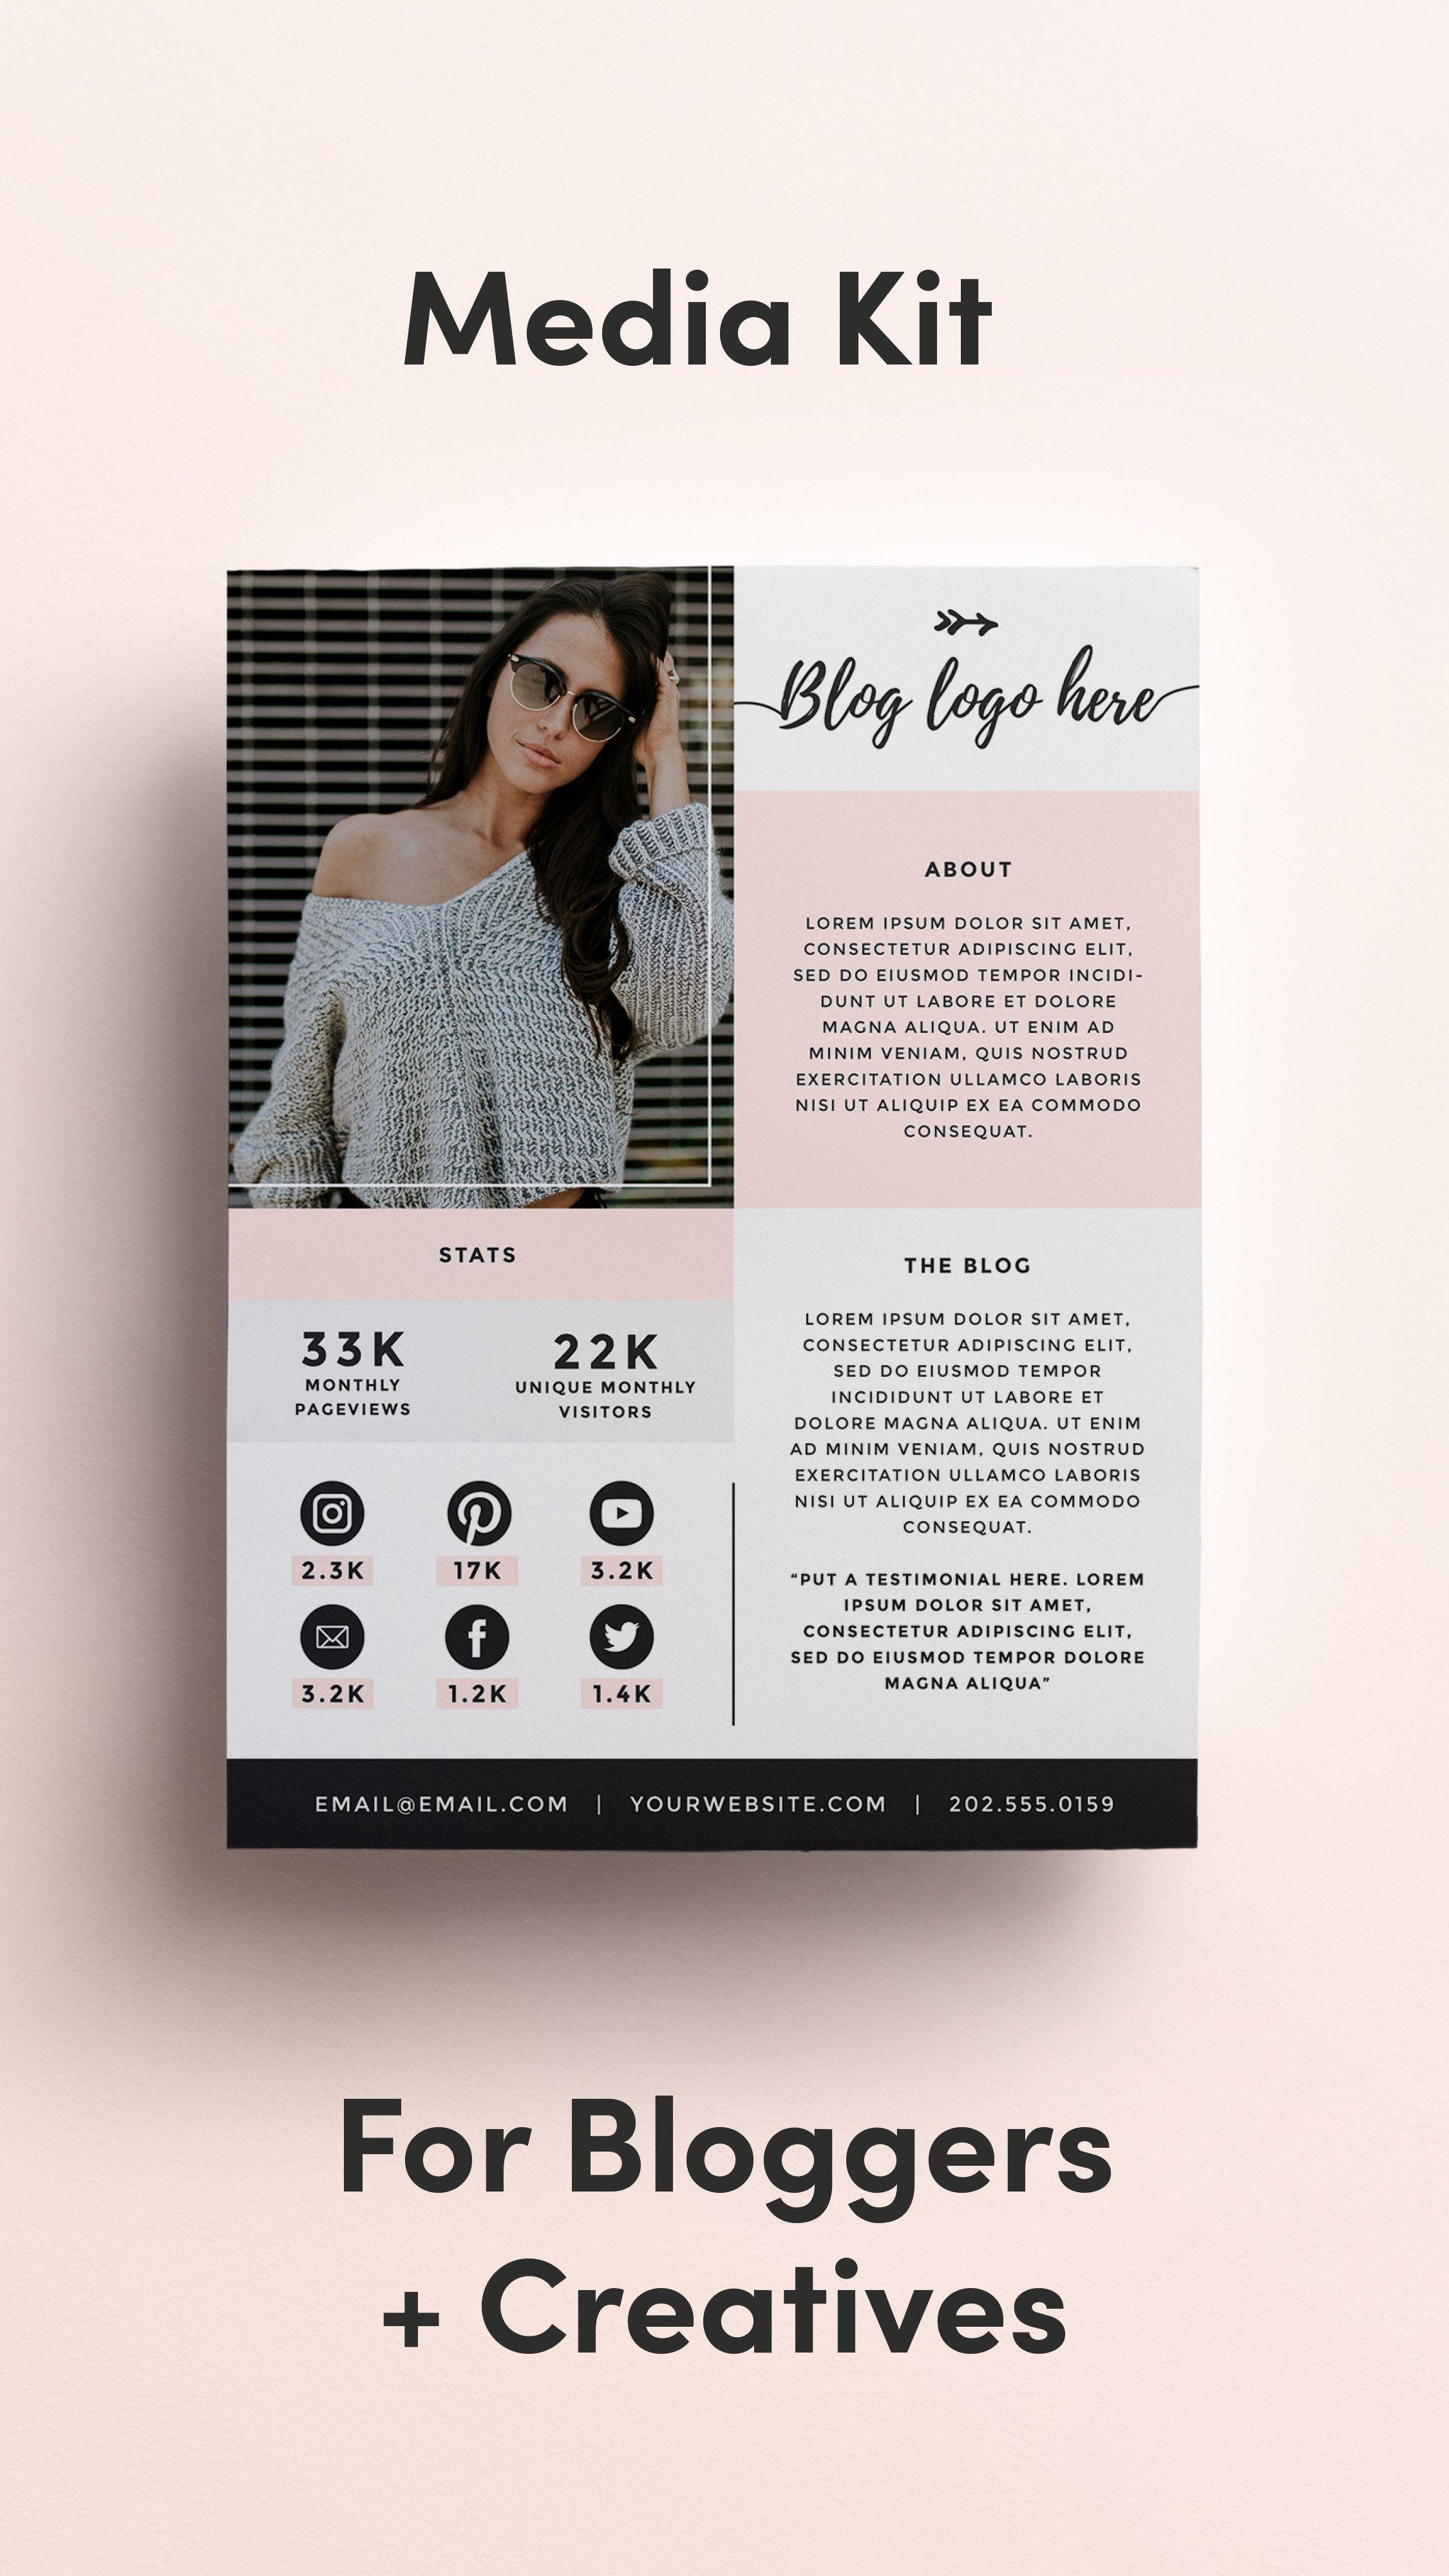 Media Kit Template For Bloggers Price List Press Kit Etsy Media Kit Template Media Kit Media Kit Design